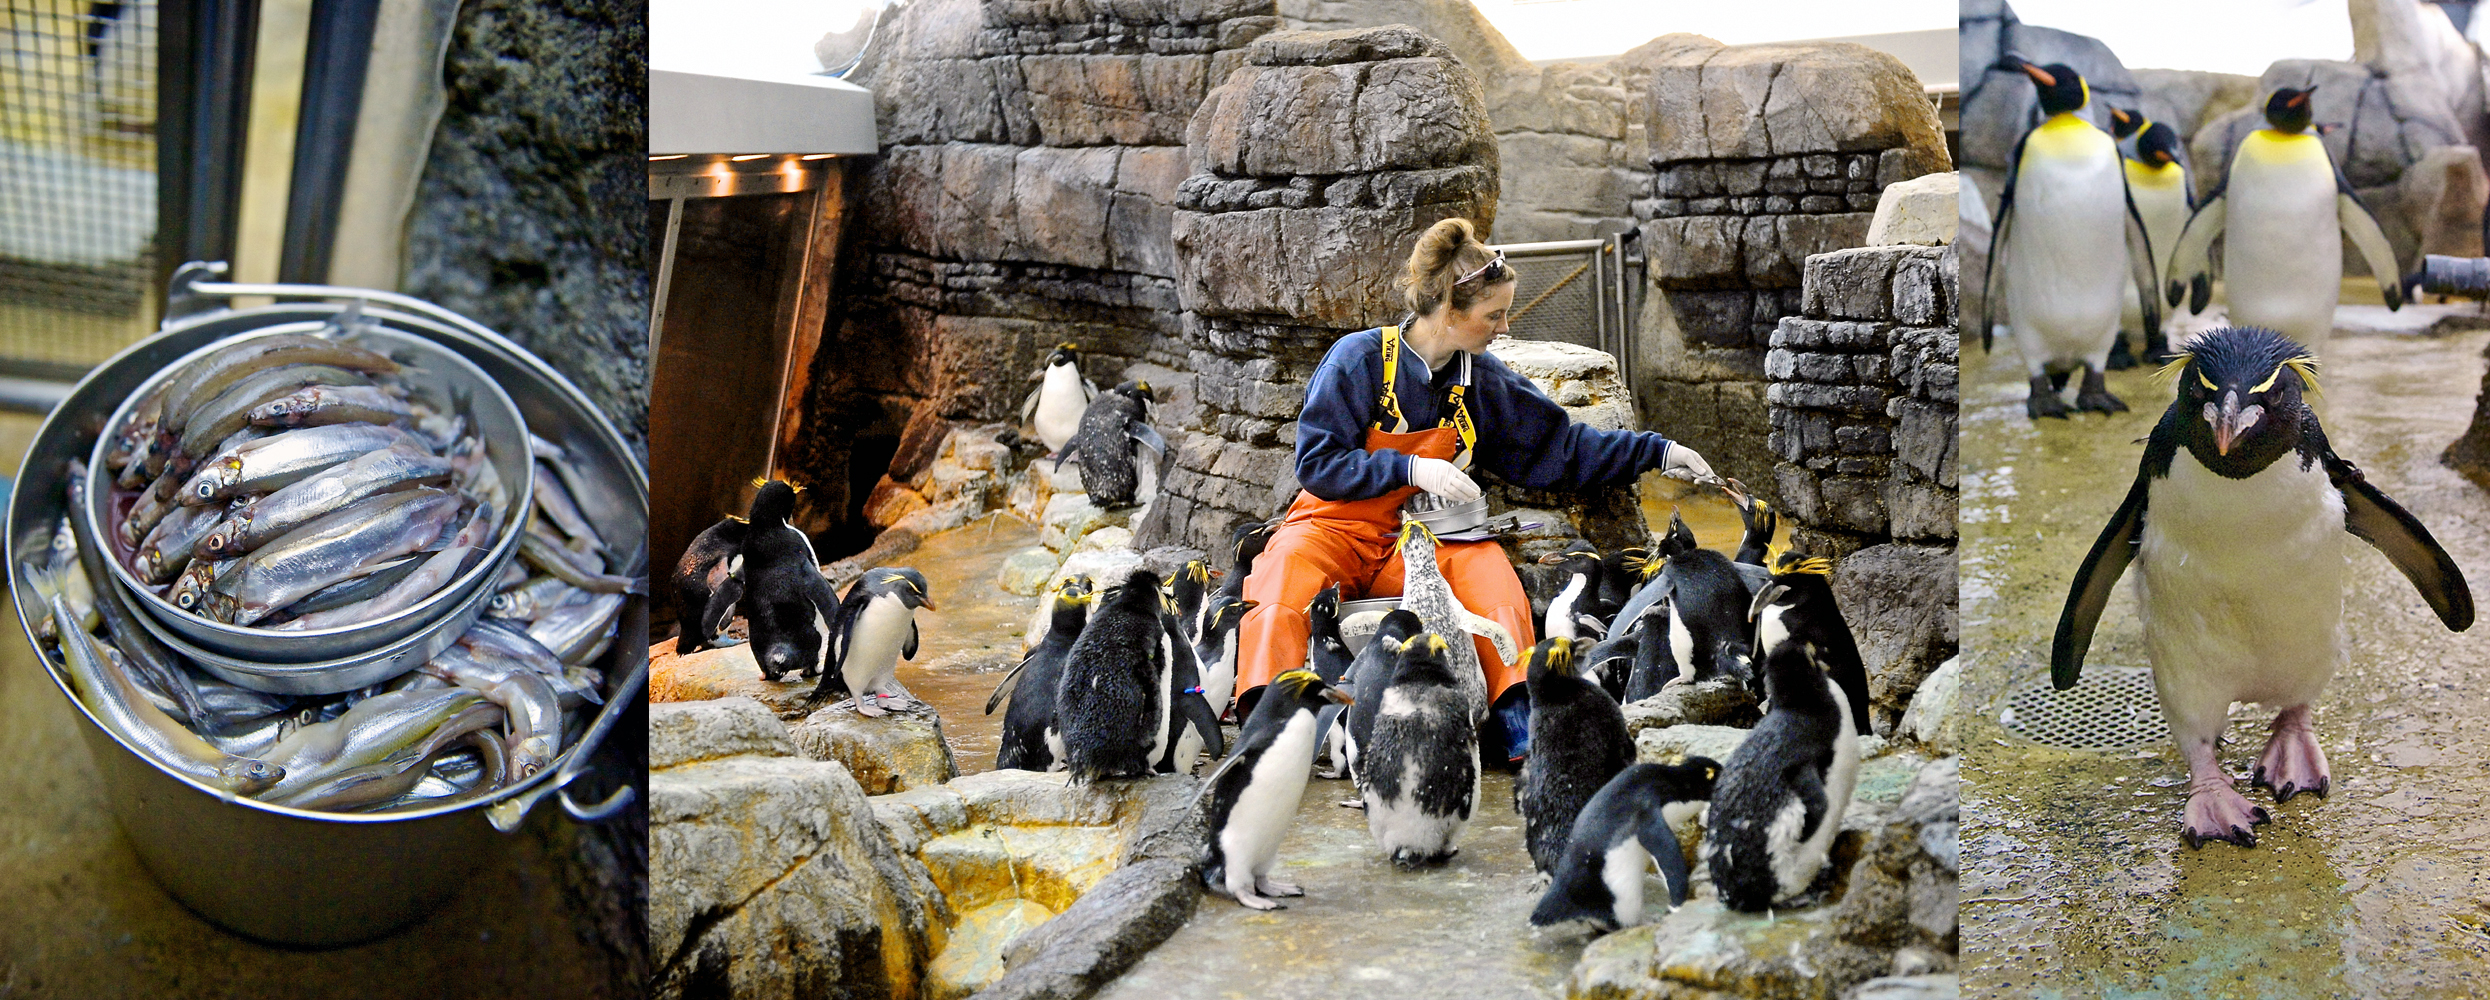 PenguinFeeding.jpg